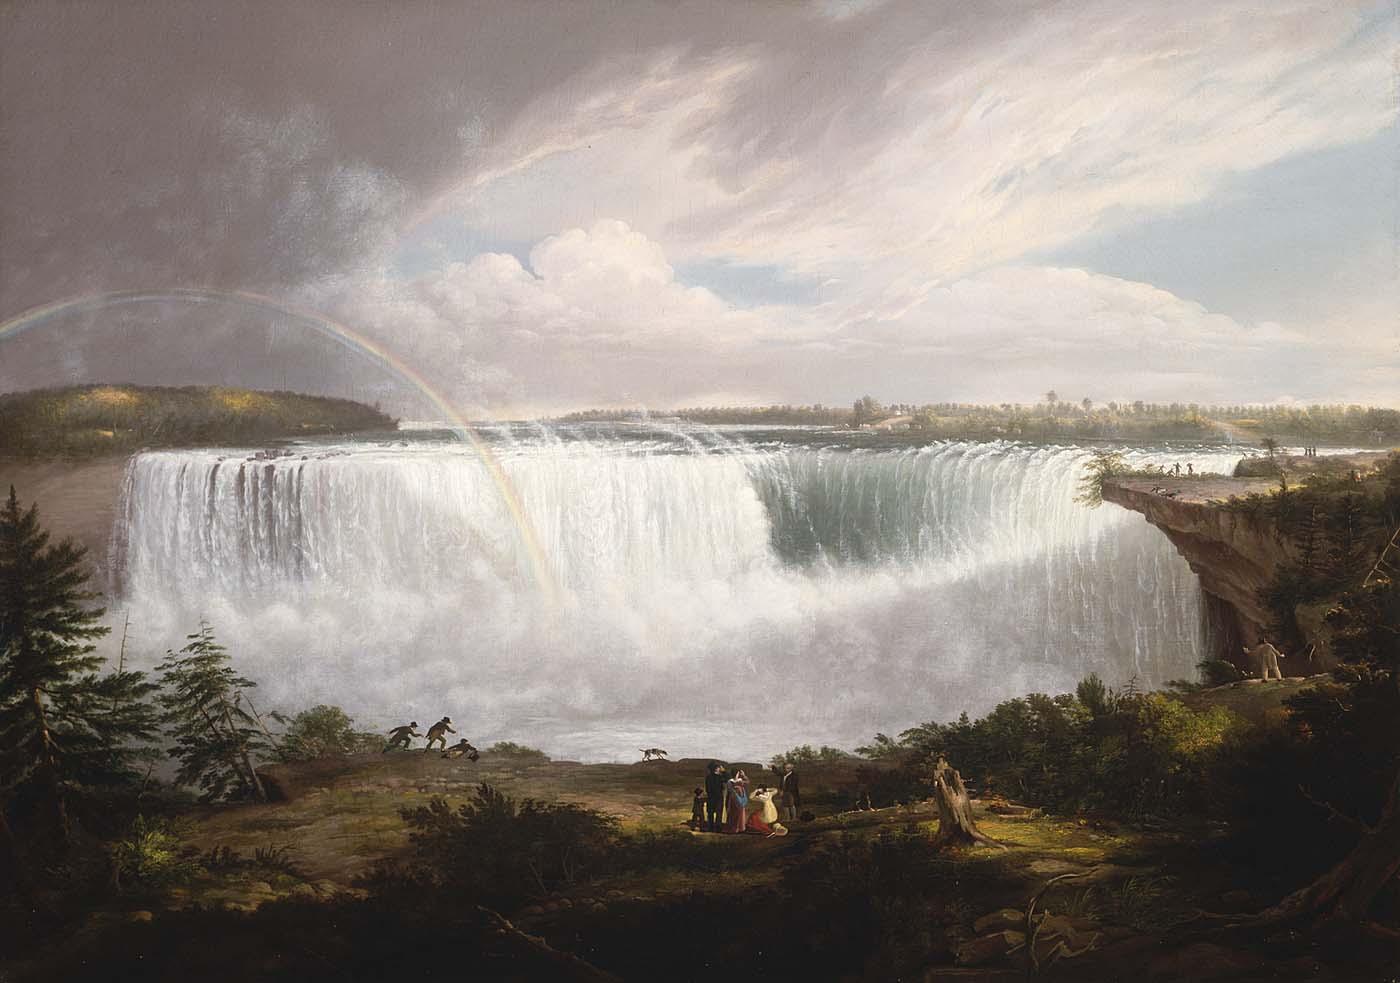 1966.82.1_1a The Great Horseshoe Fall, Niagara